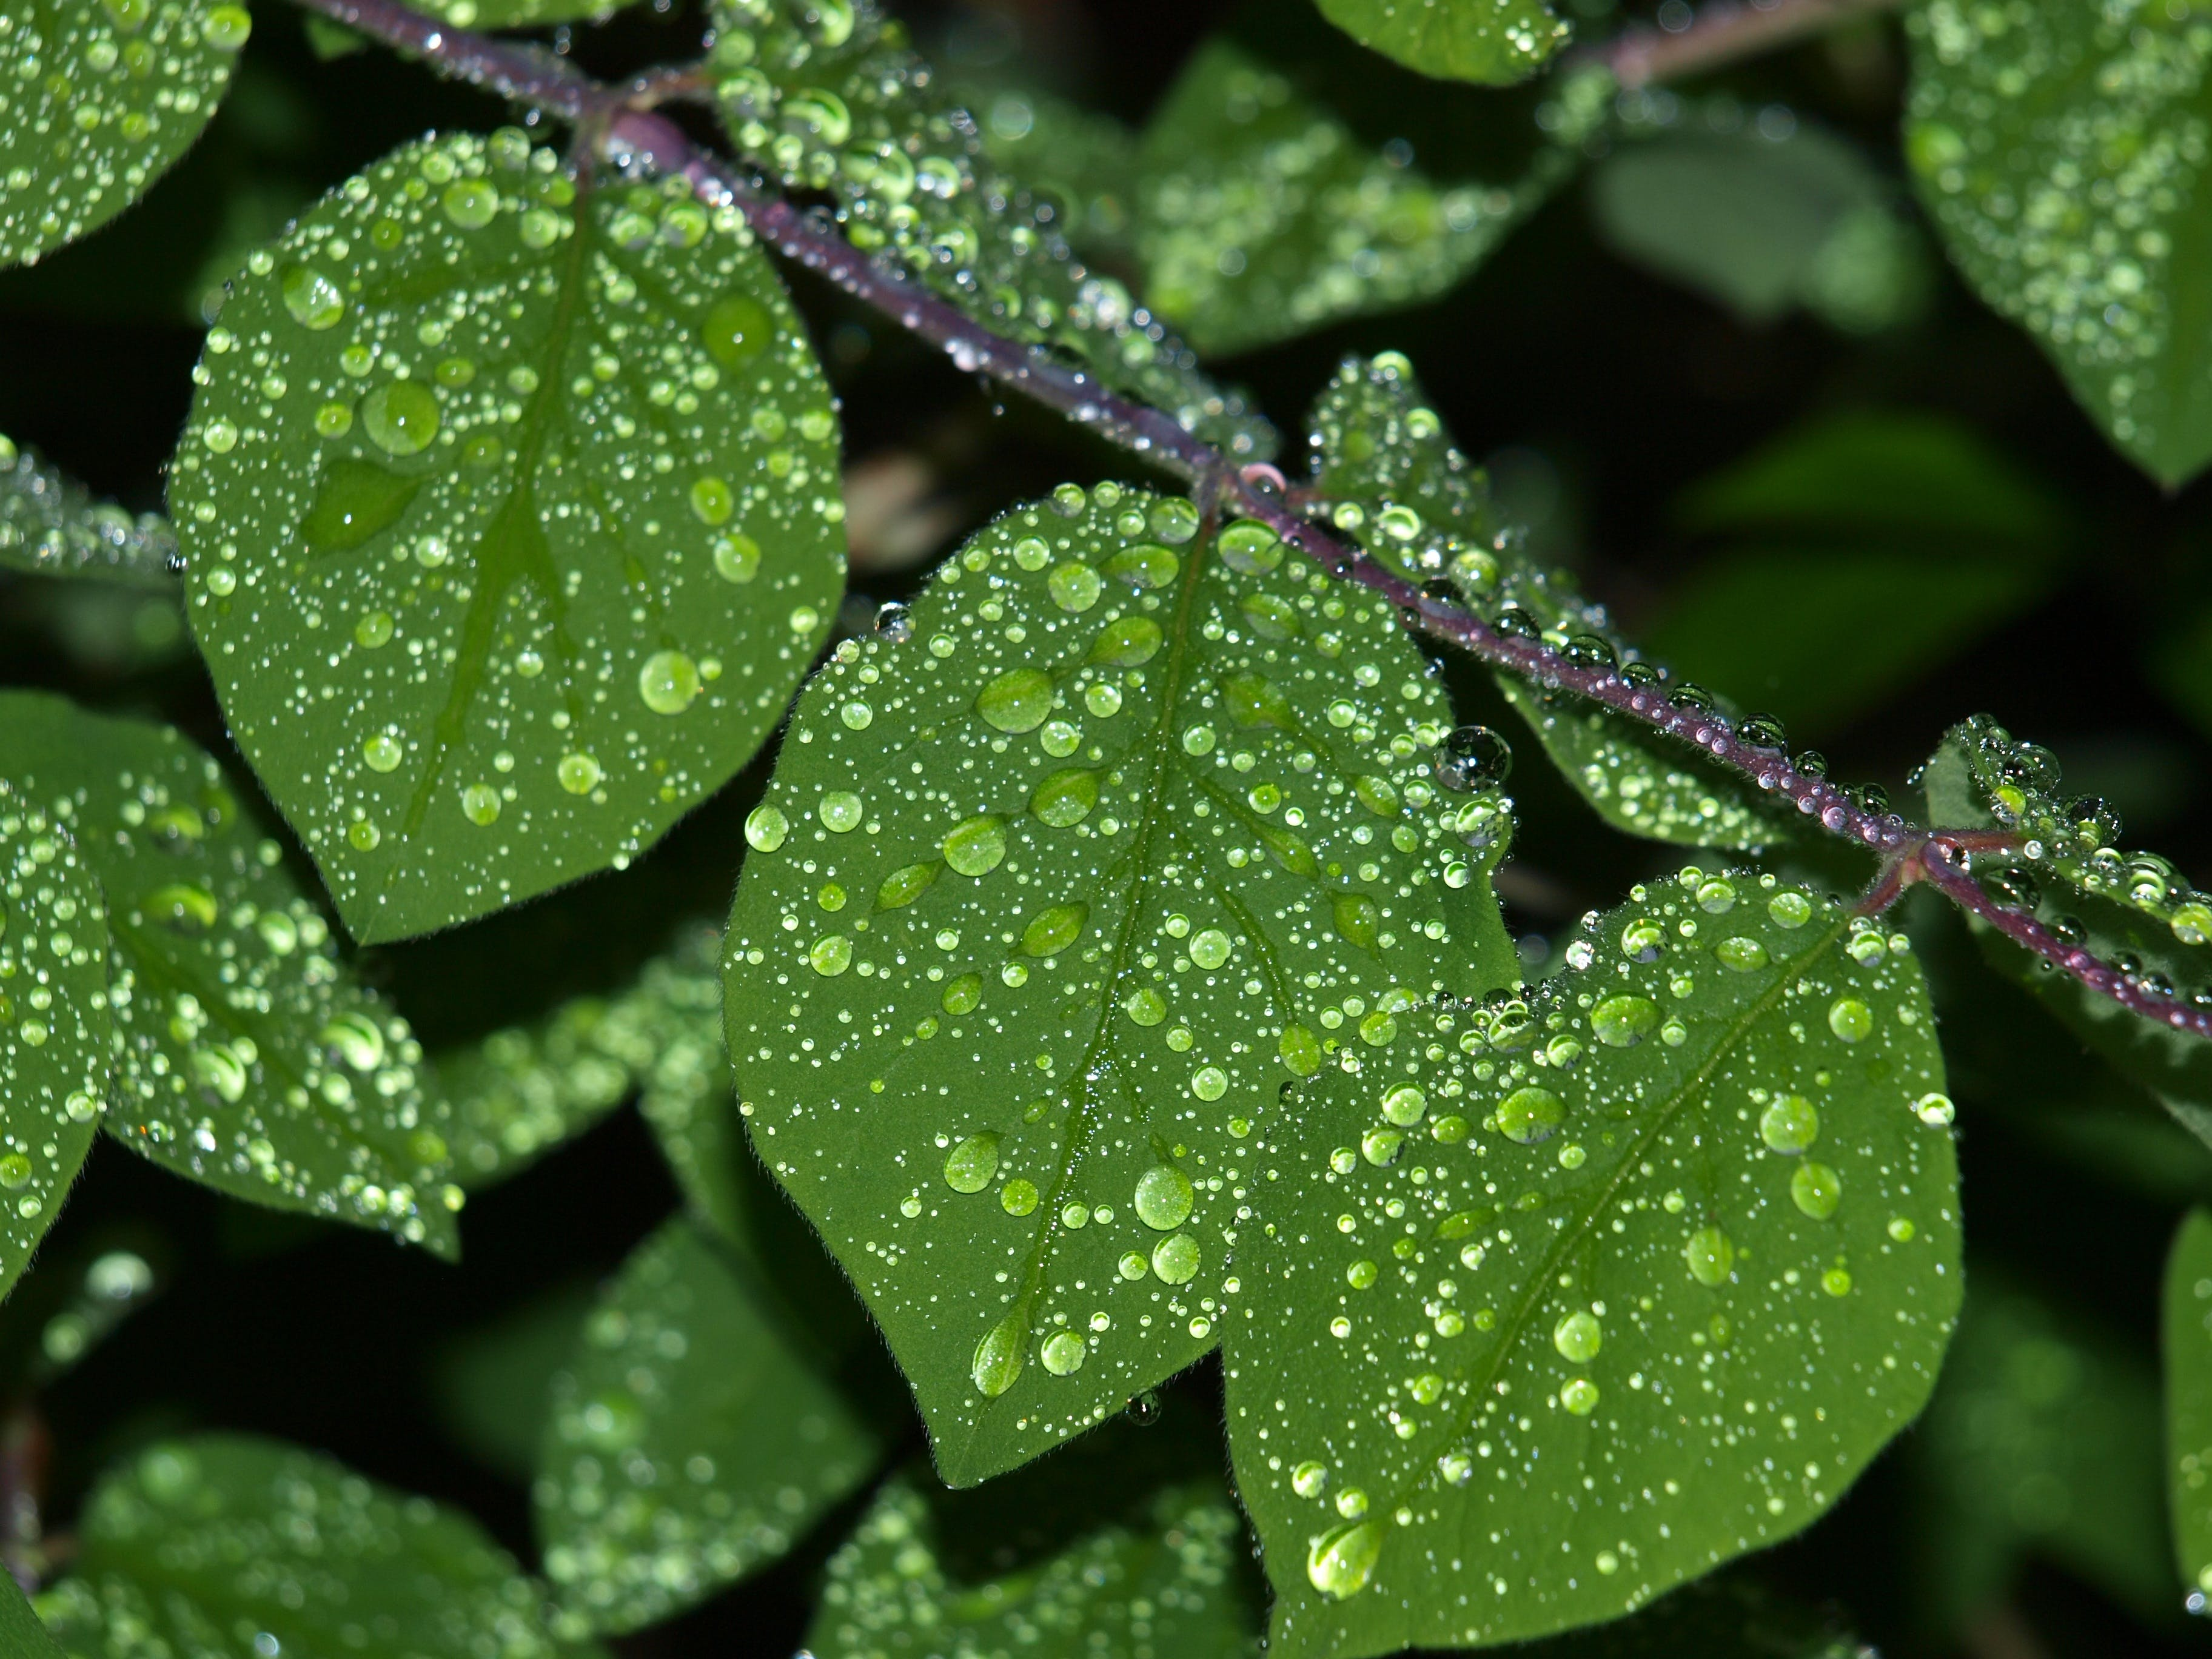 Free stock photo of drop of water, leaf, rain